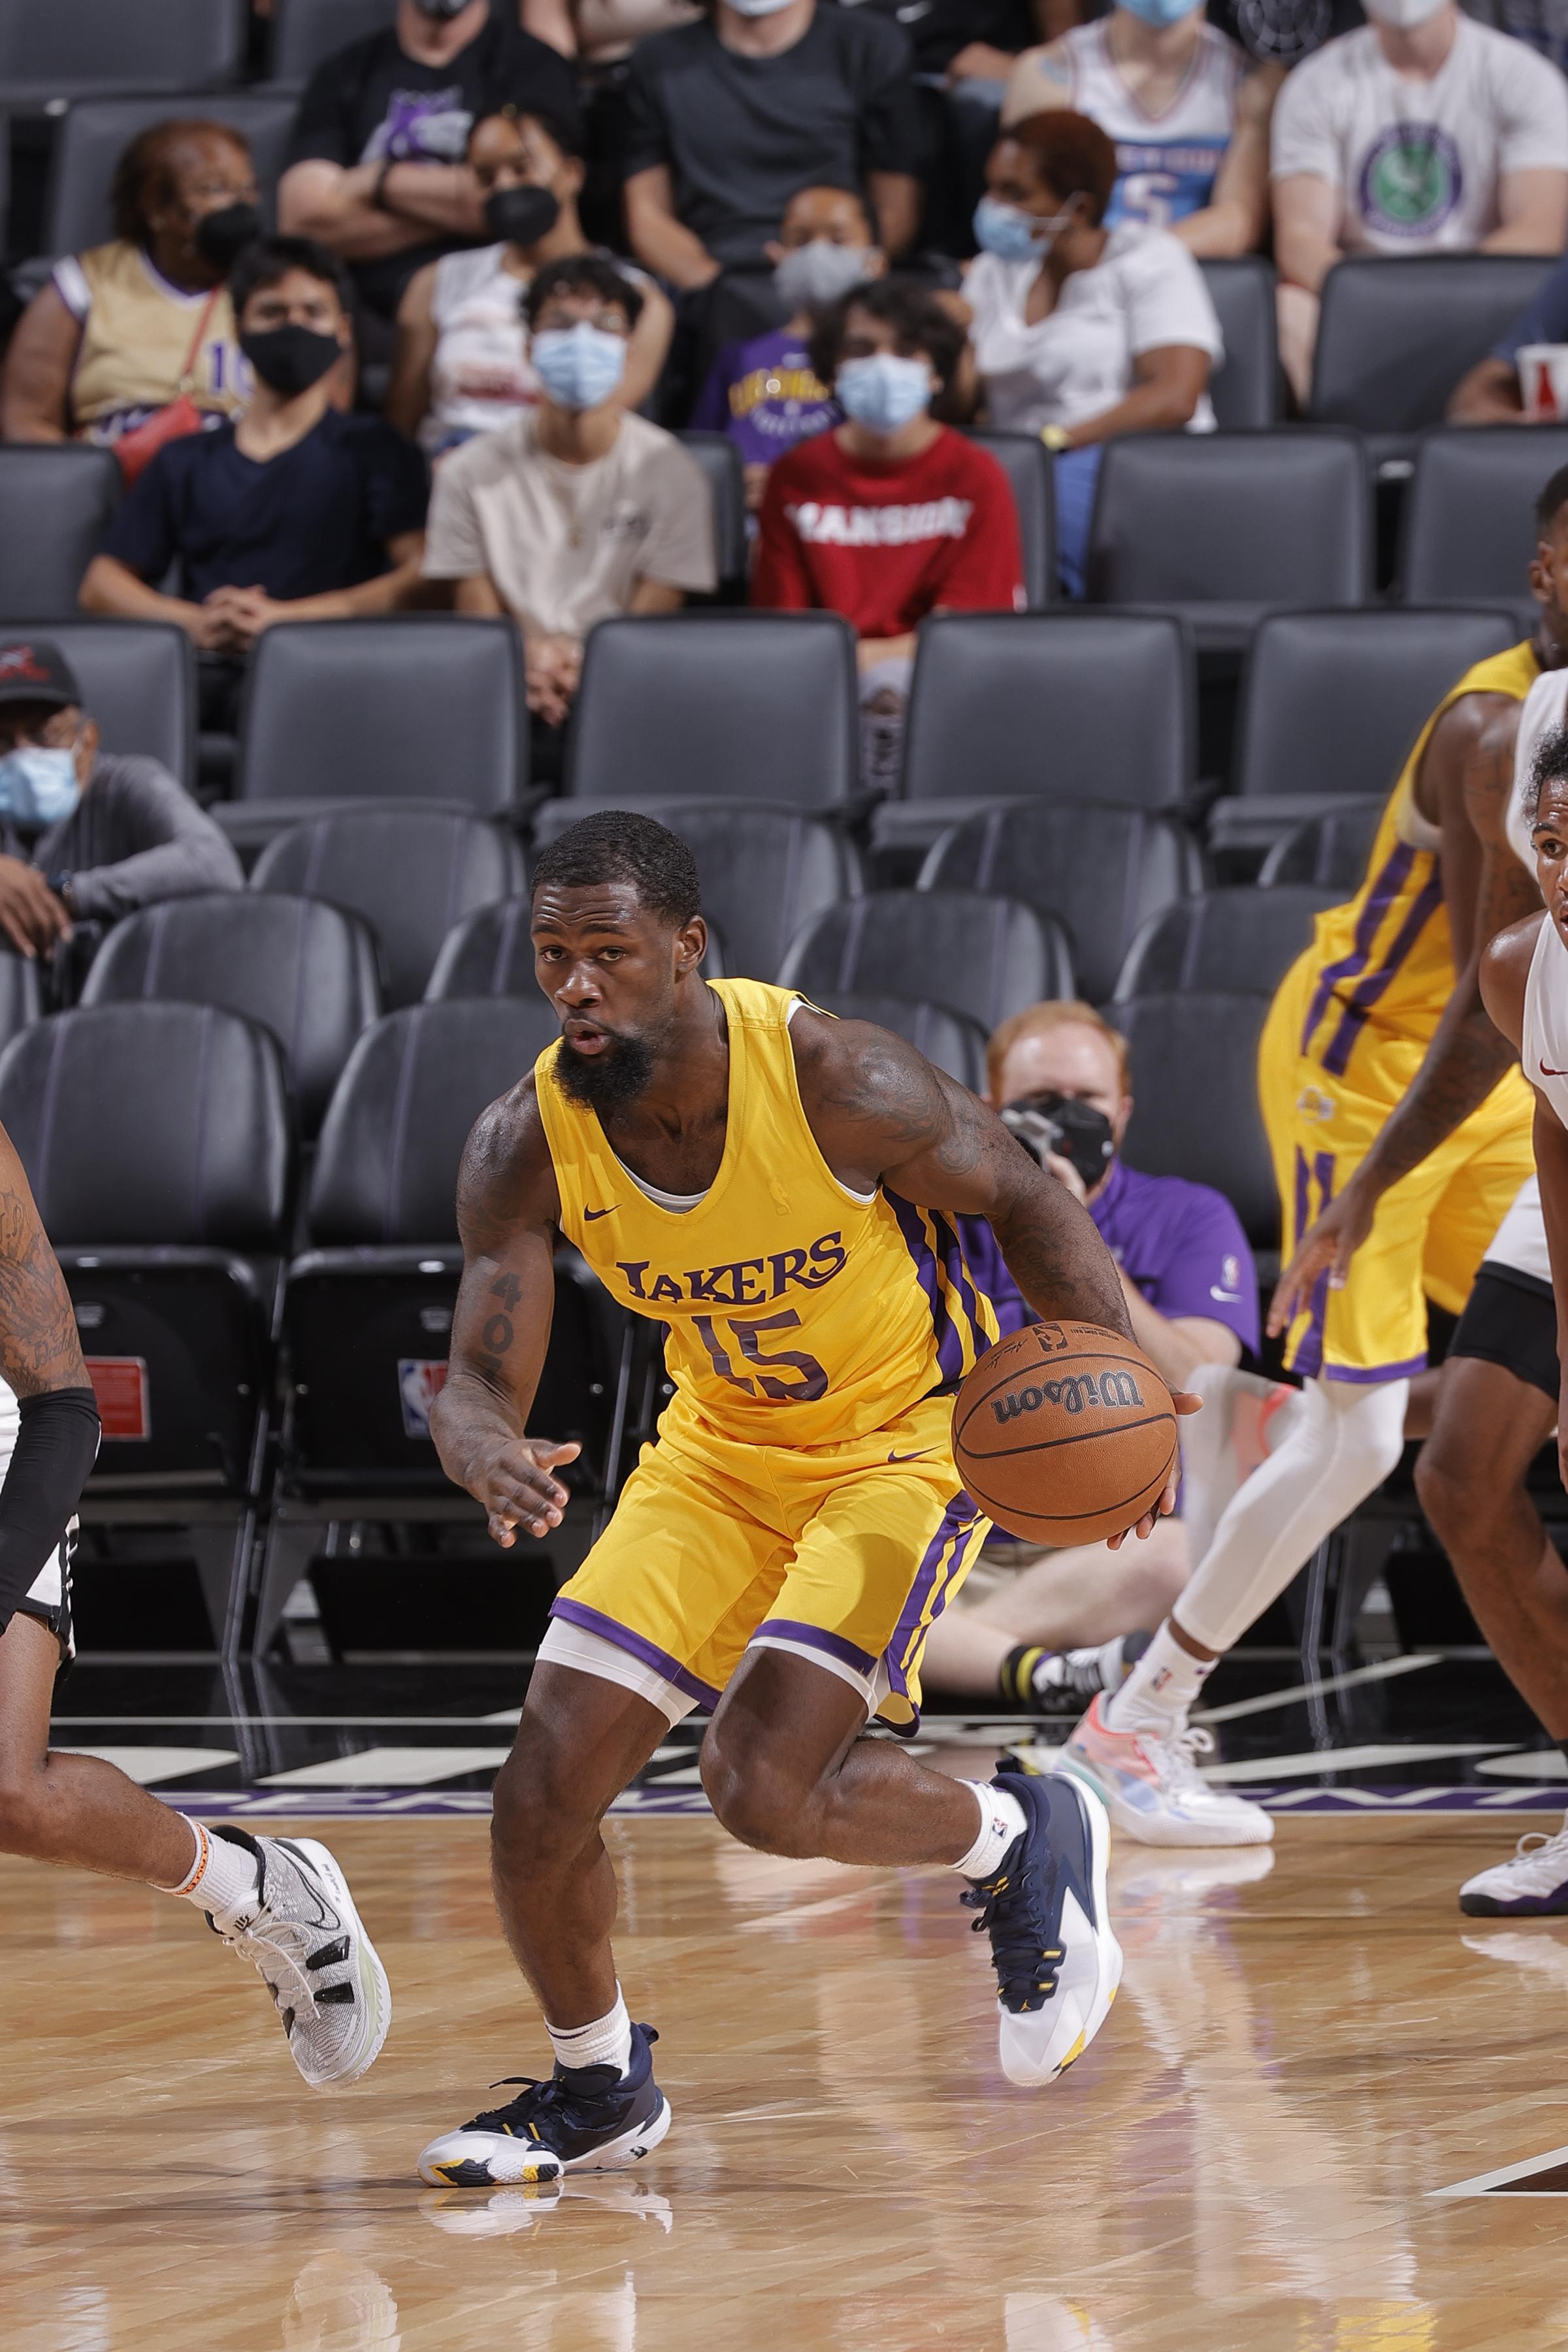 2021 California Classic Summer League: Los Angeles Lakers v Miami Heat